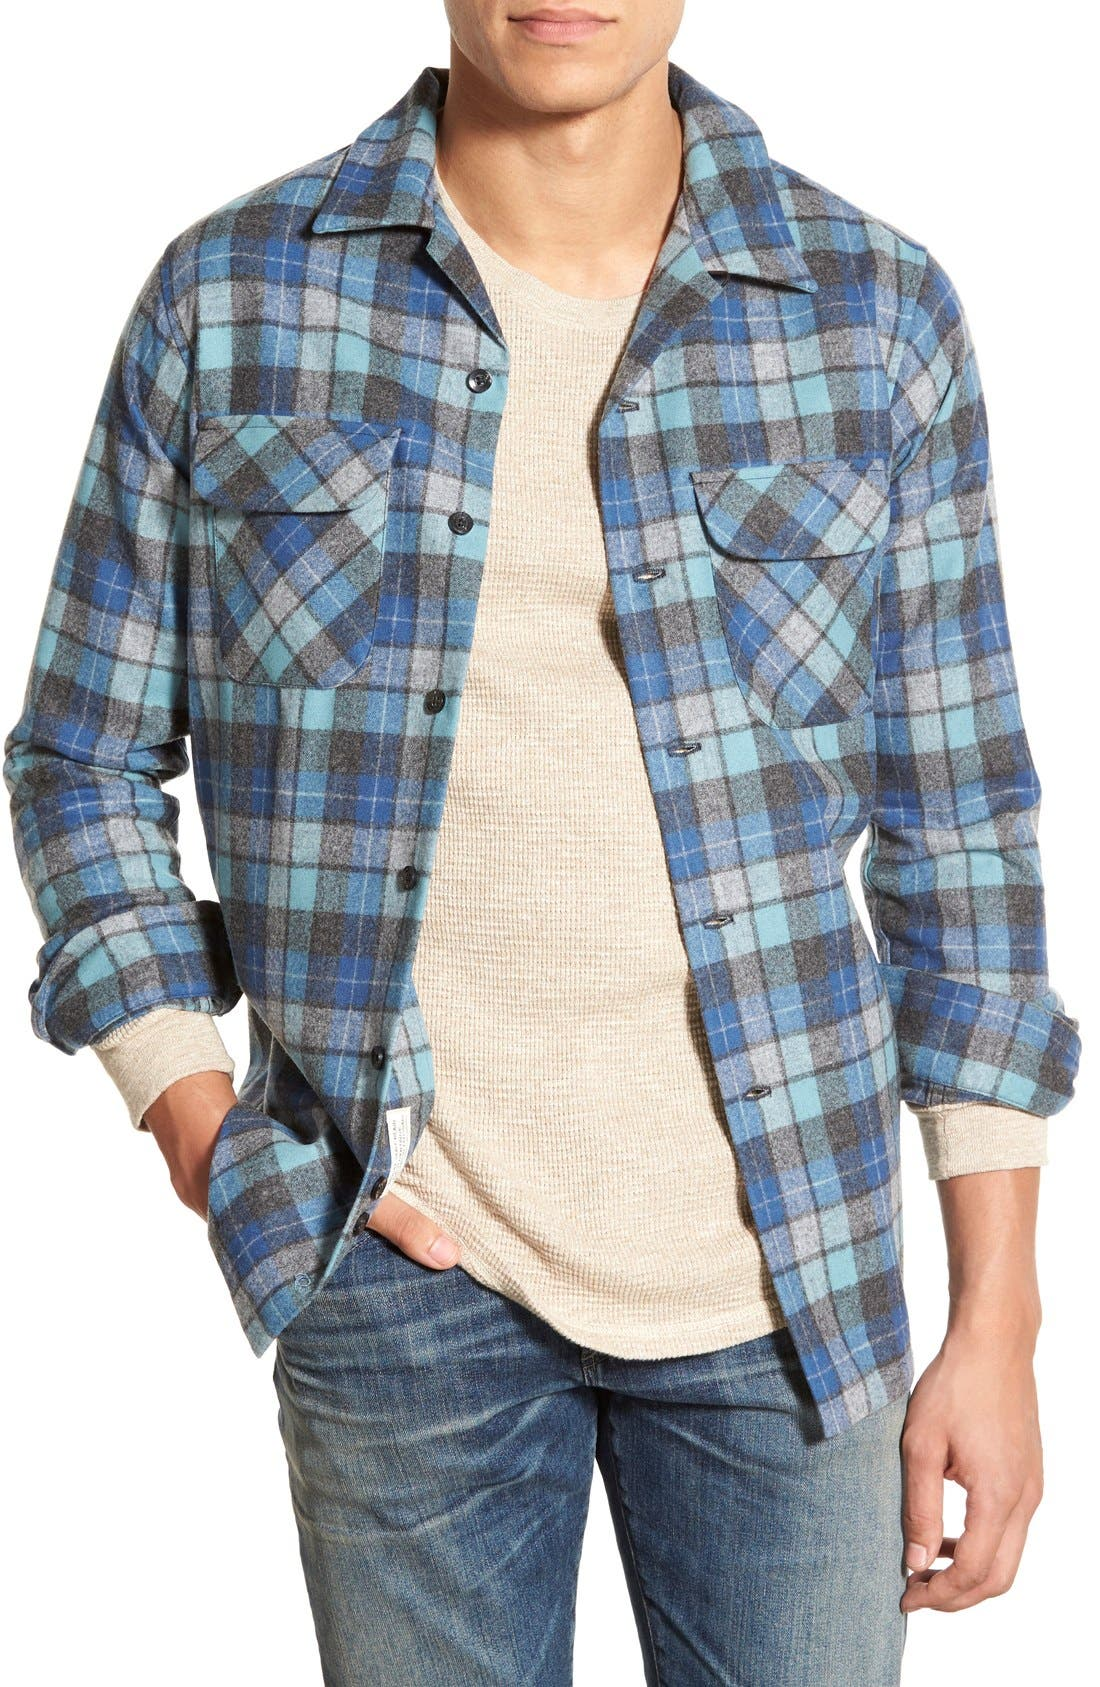 'Board' Regular Fit Flannel Shirt,                         Main,                         color, Blue Original Surf Plaid